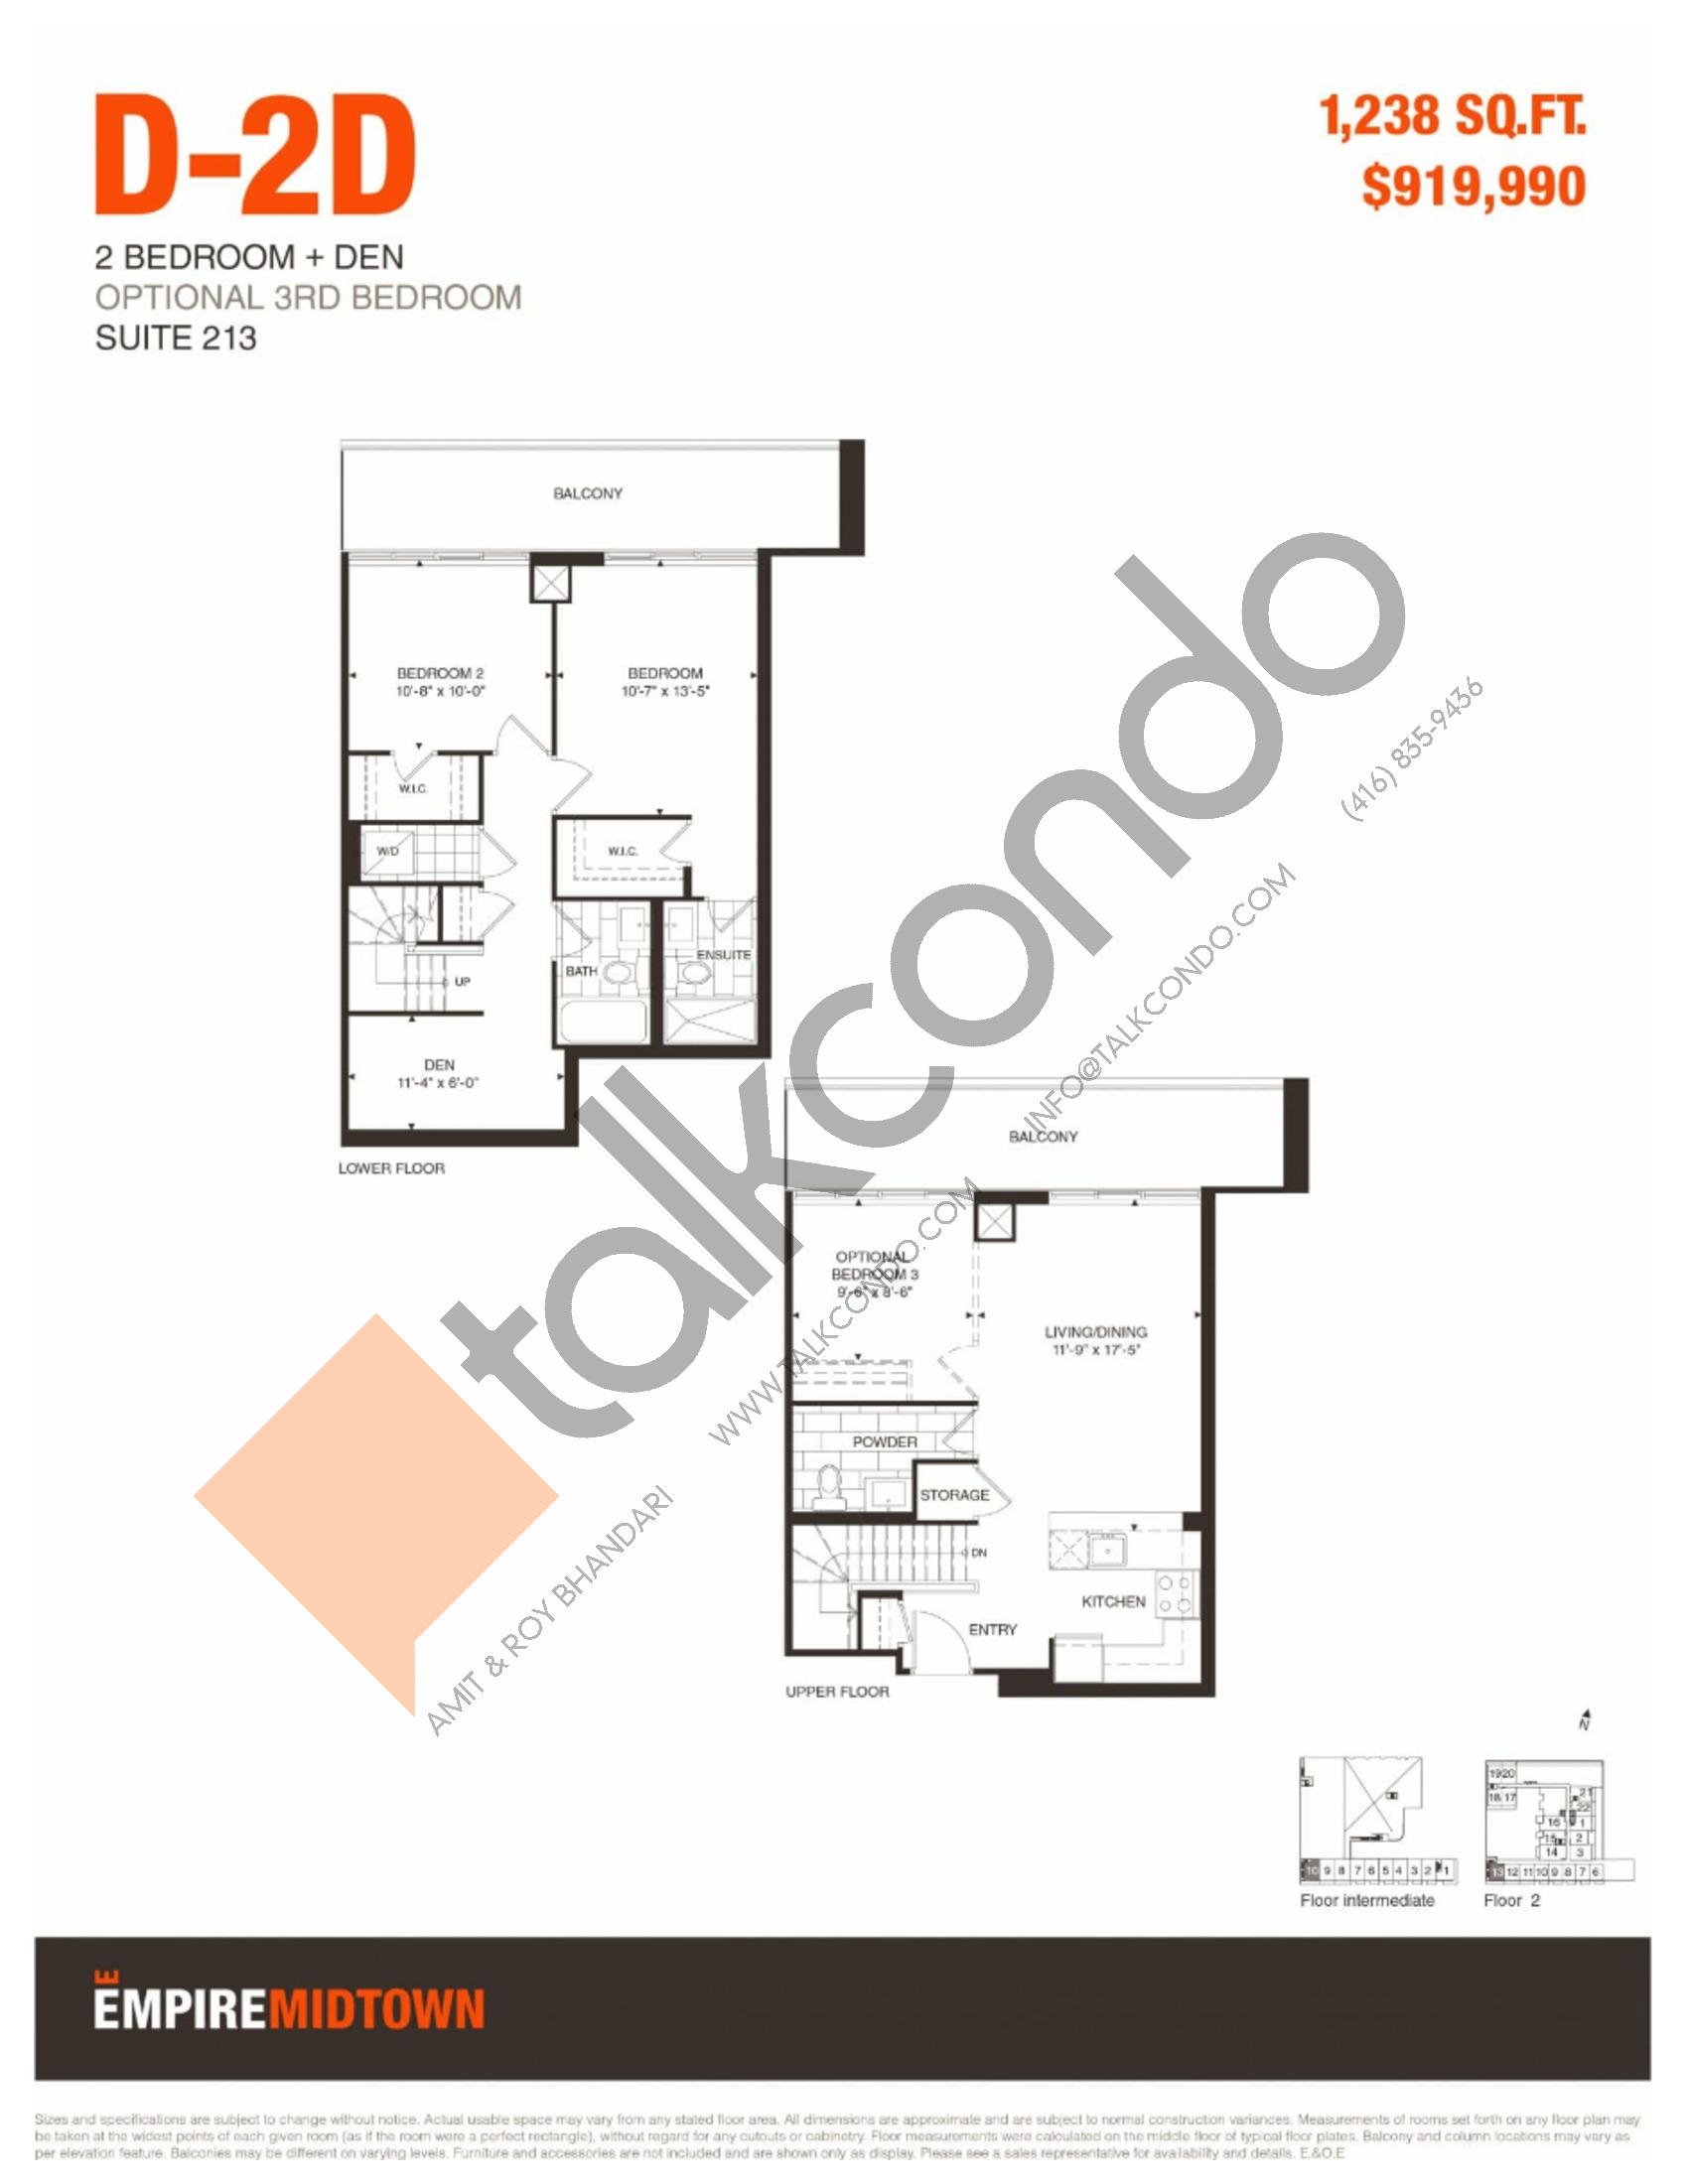 Empire Midtown Condos Floor Plans Prices Availability Talkcondo